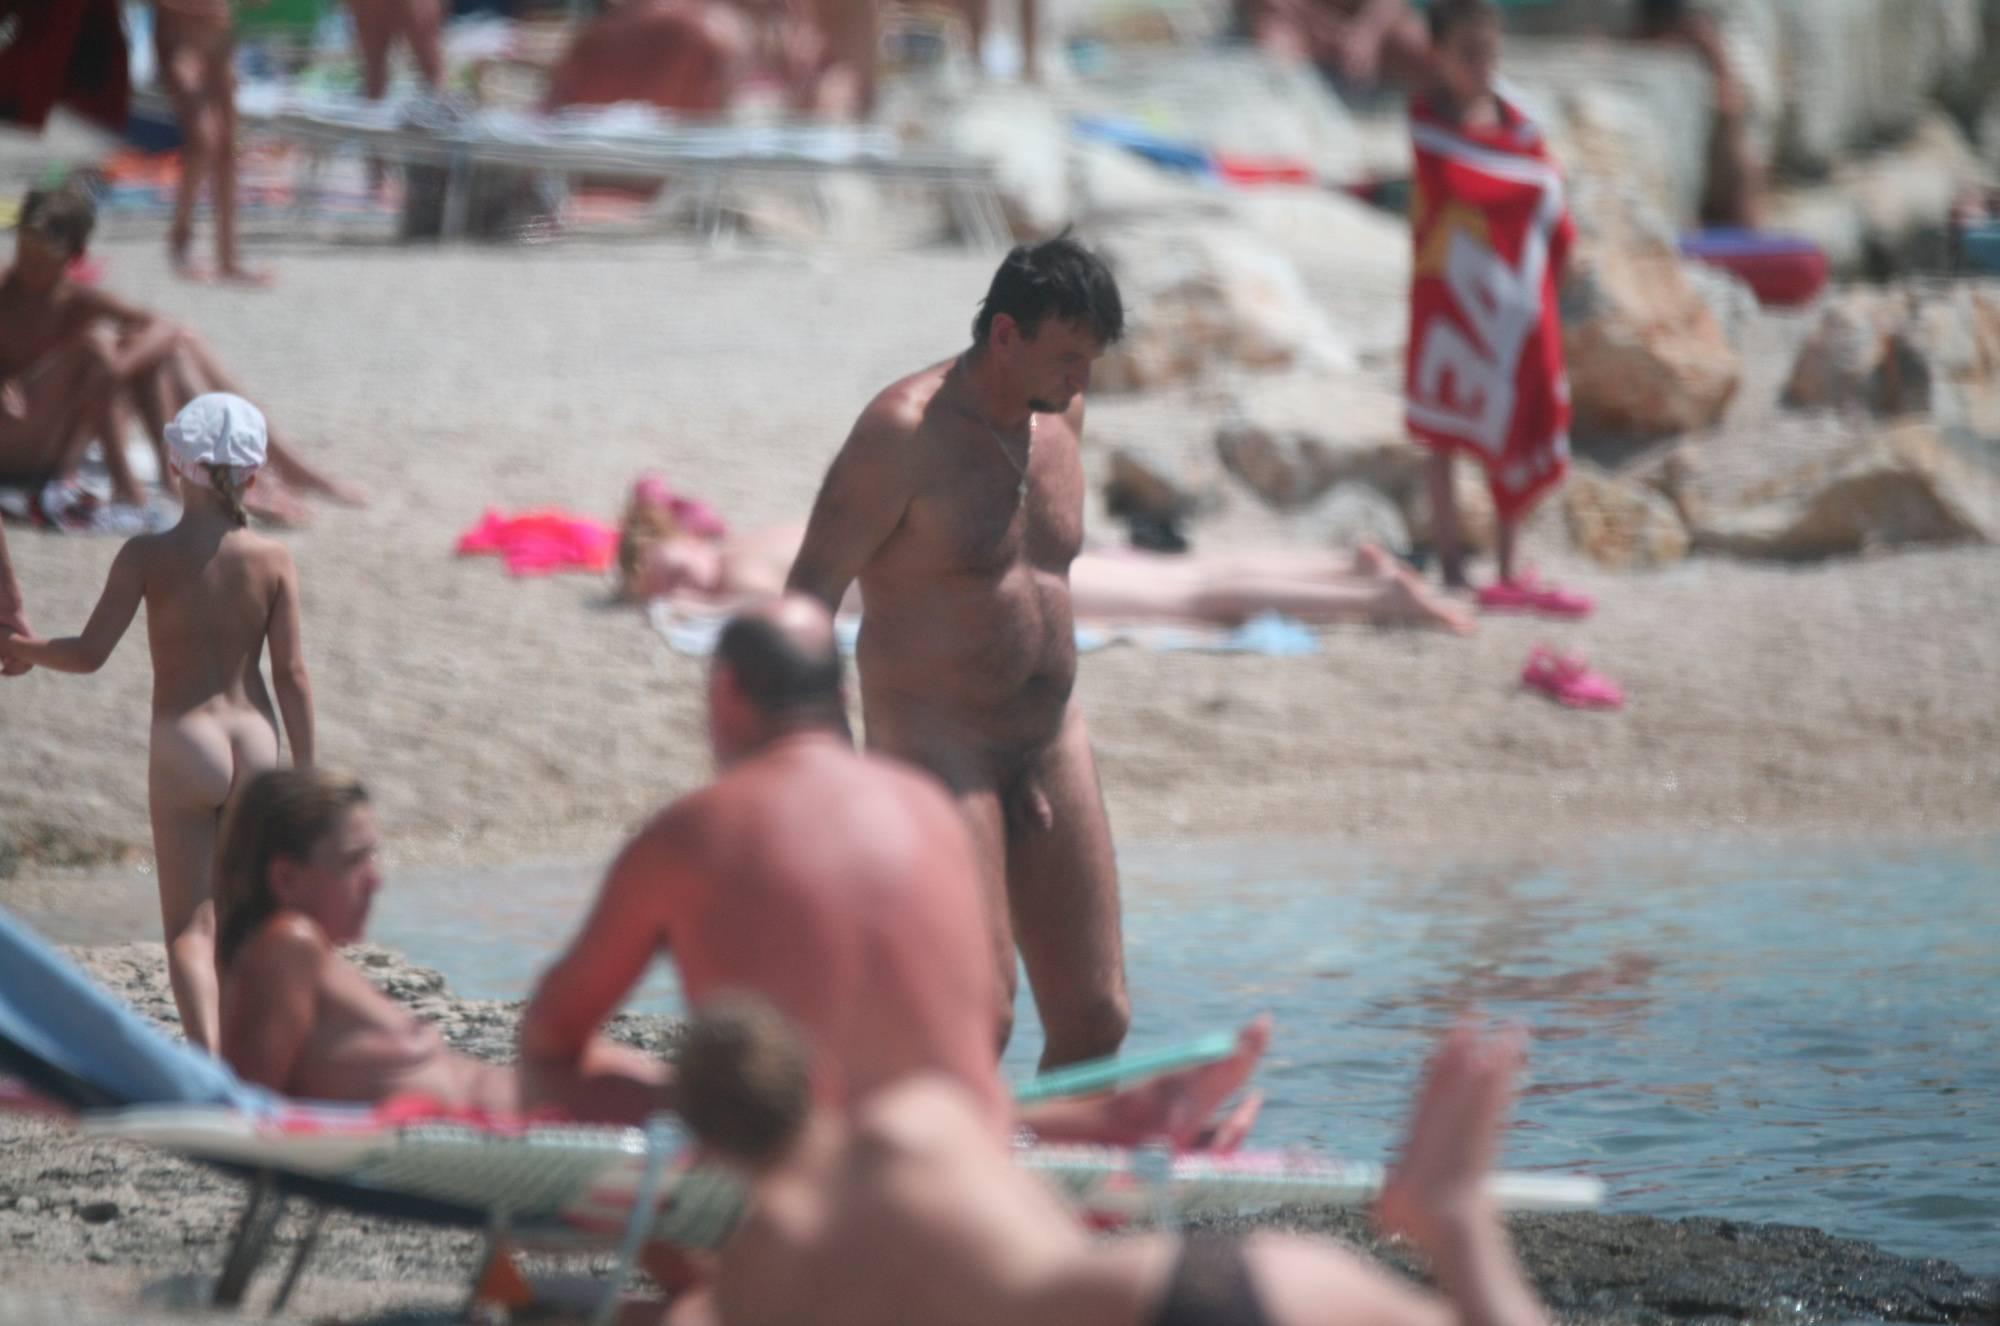 Nudist Gallery Avilia FKK Naturist Beach - 1